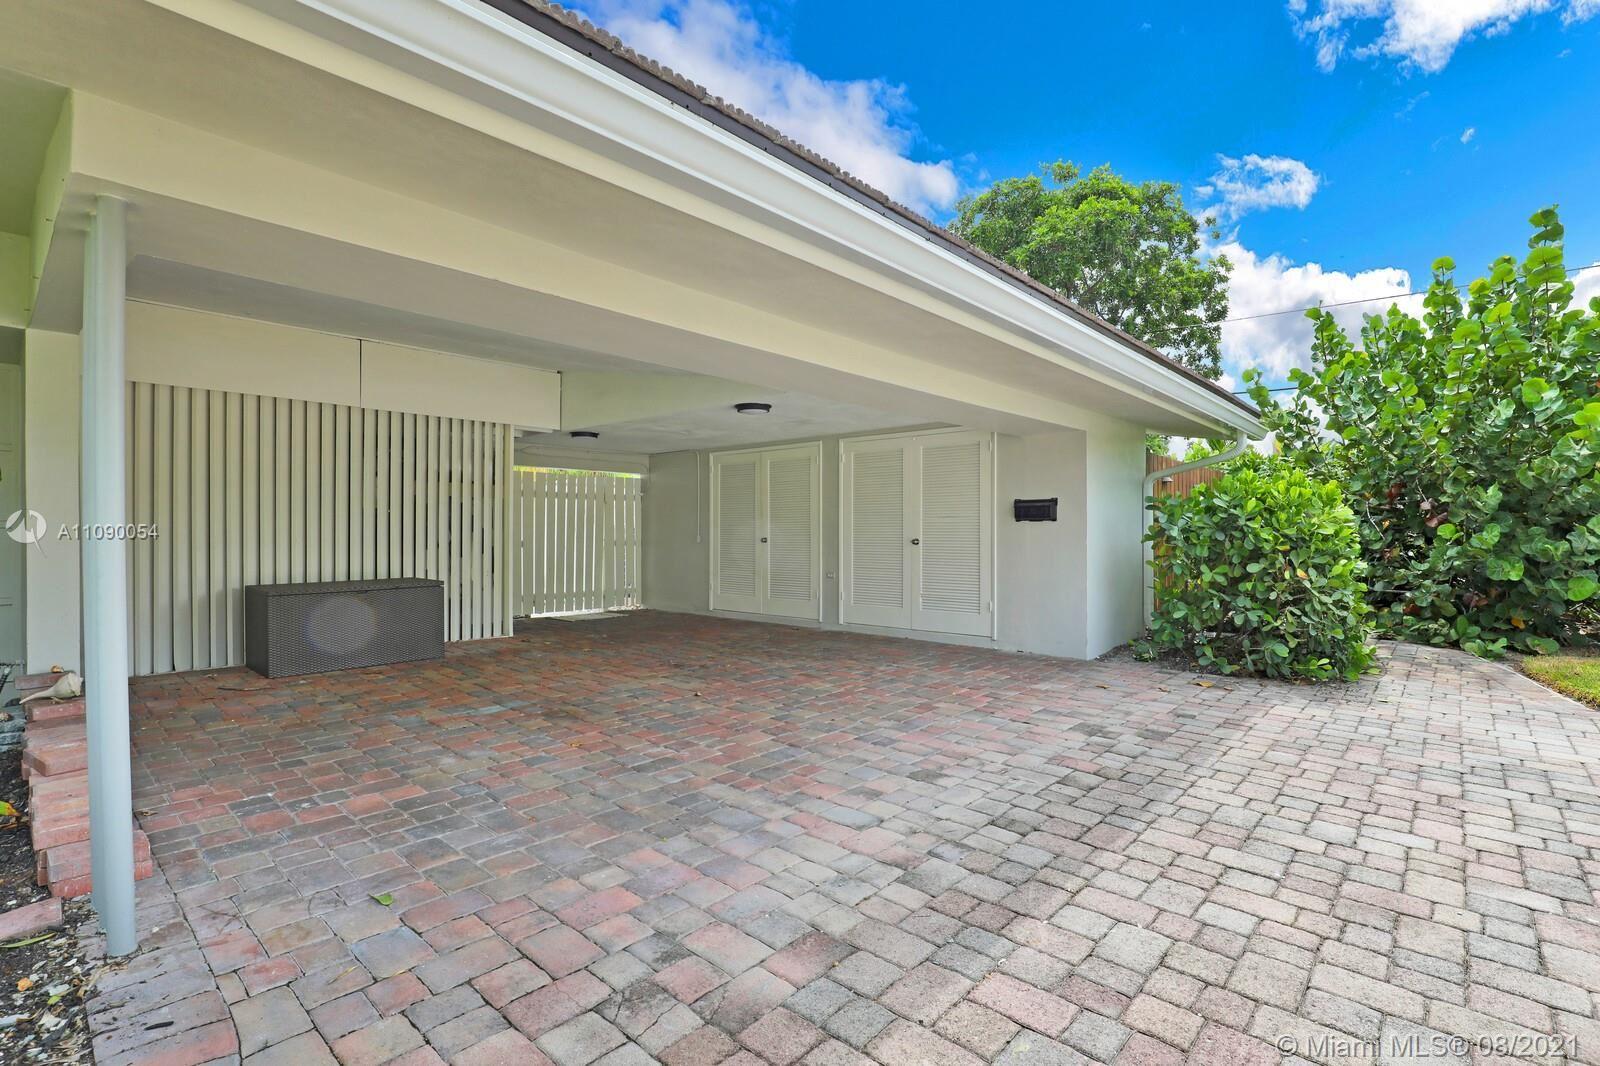 Photo of 2624 NE 29th St, Fort Lauderdale, FL 33306 (MLS # A11090054)